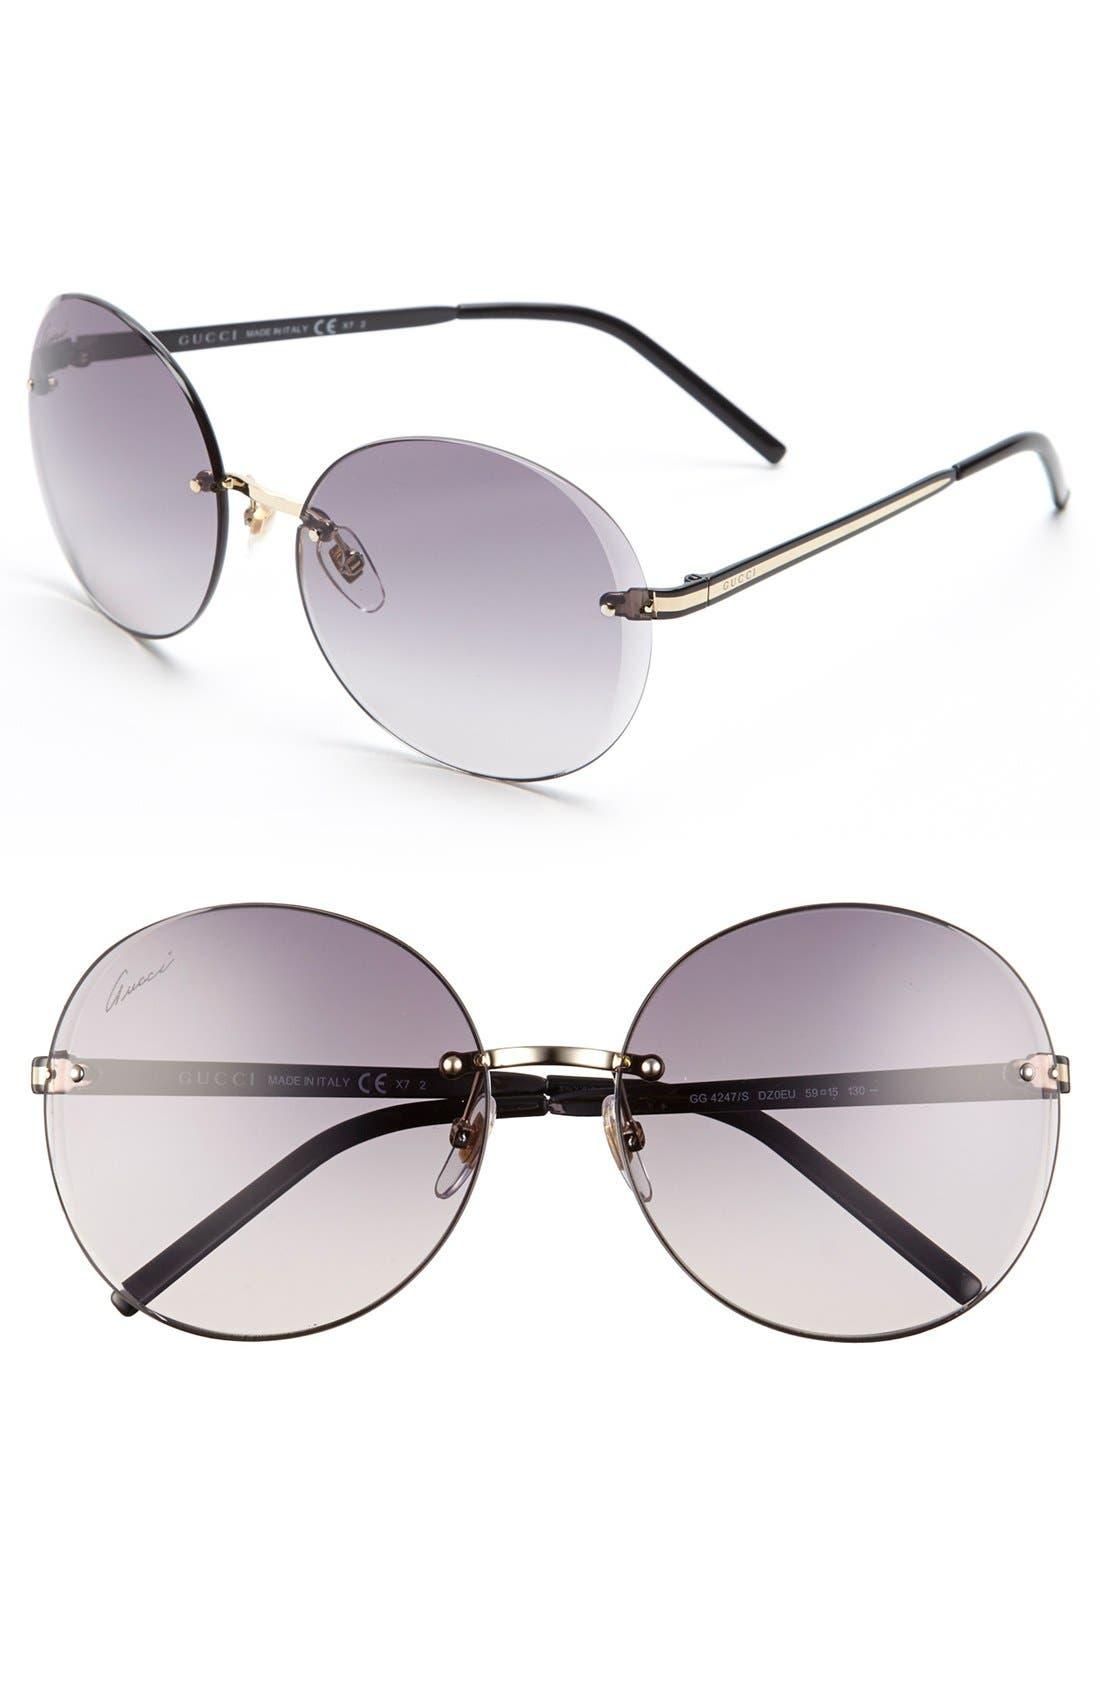 Main Image - Gucci 'Flora' 59mm Rimless Sunglasses